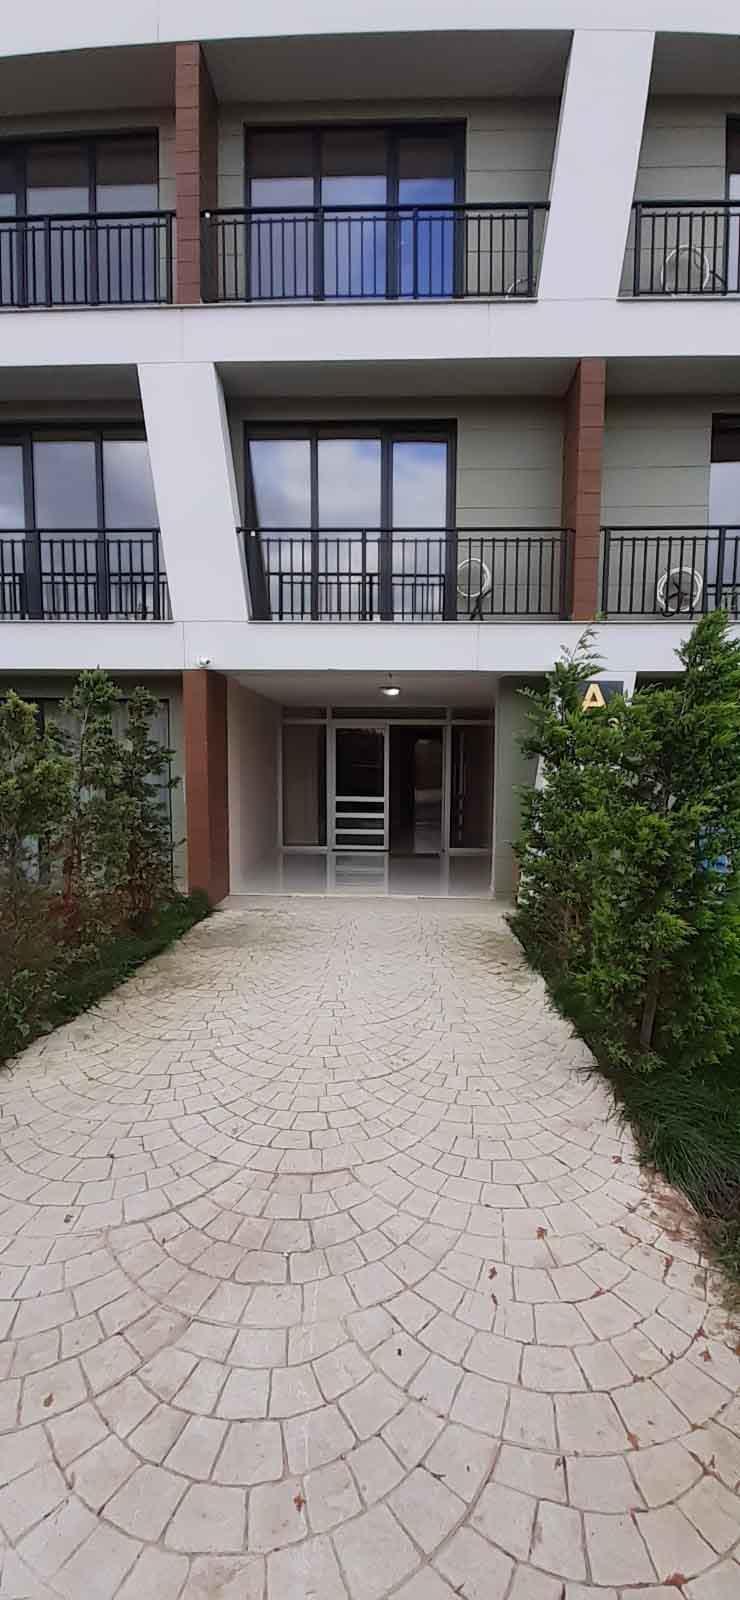 istanbul-house1-safiran